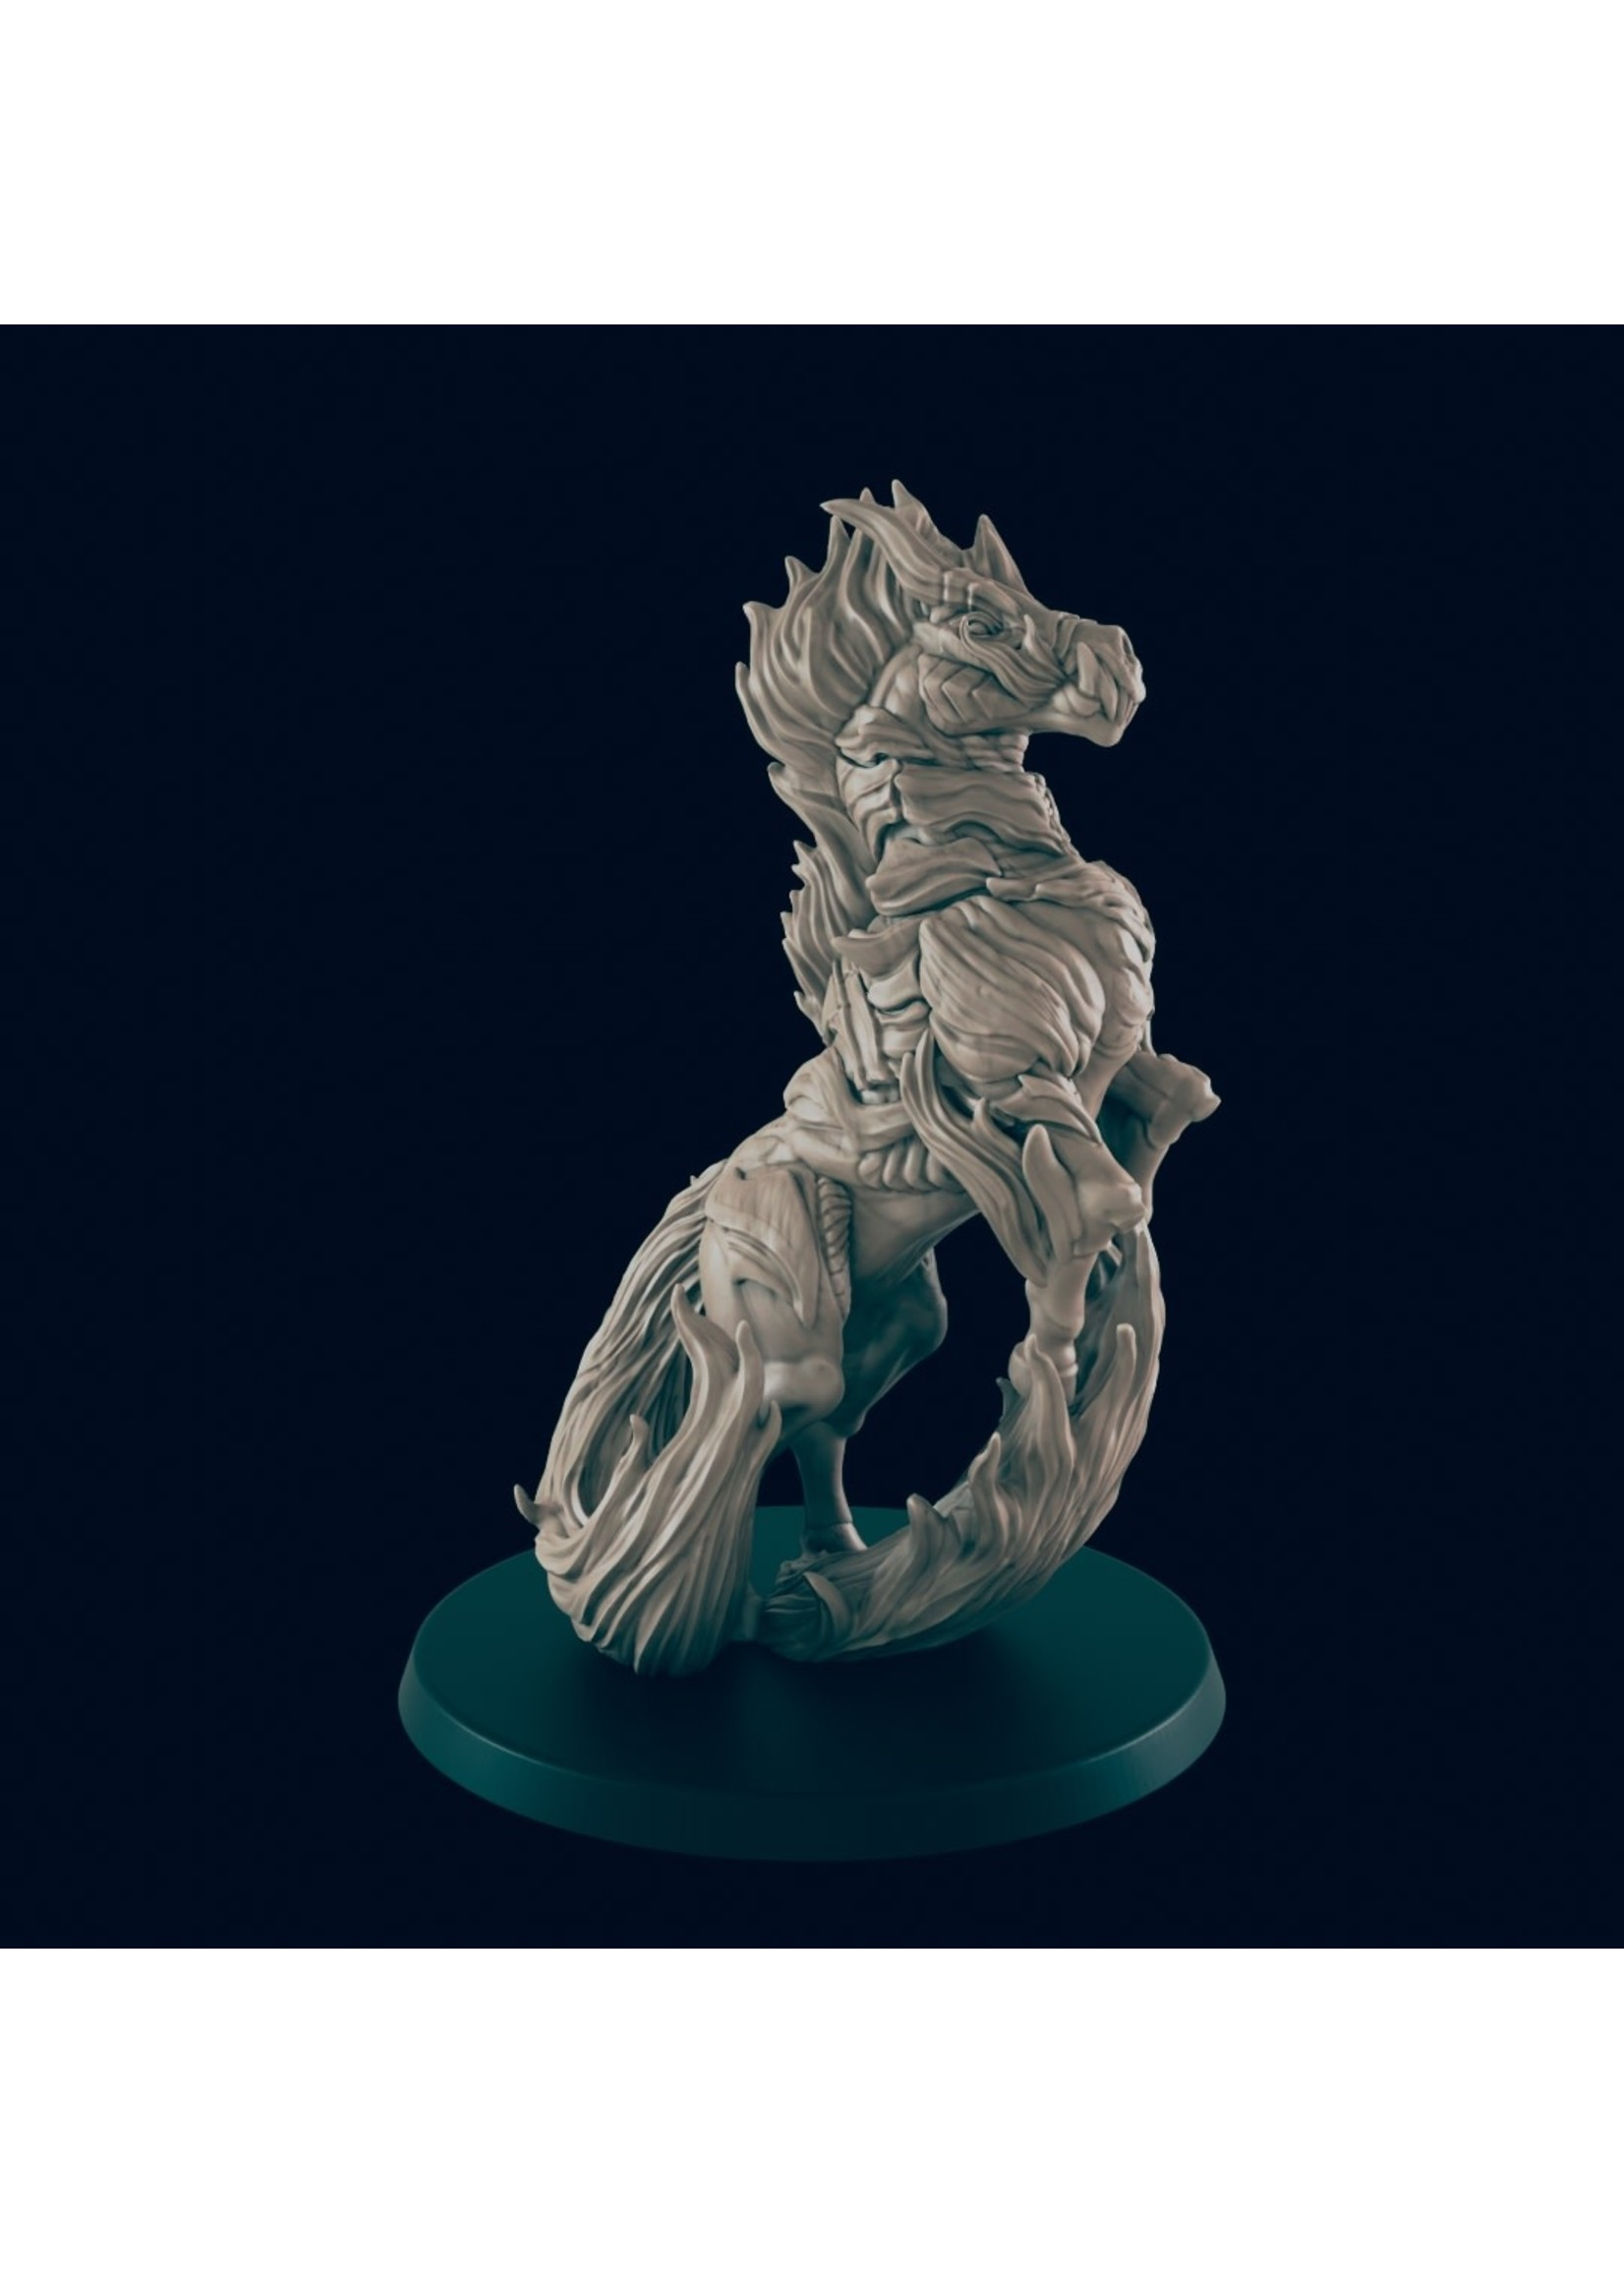 3D Printed Miniature - Nightmare - Dungeons & Dragons - Beasts and Baddies KS